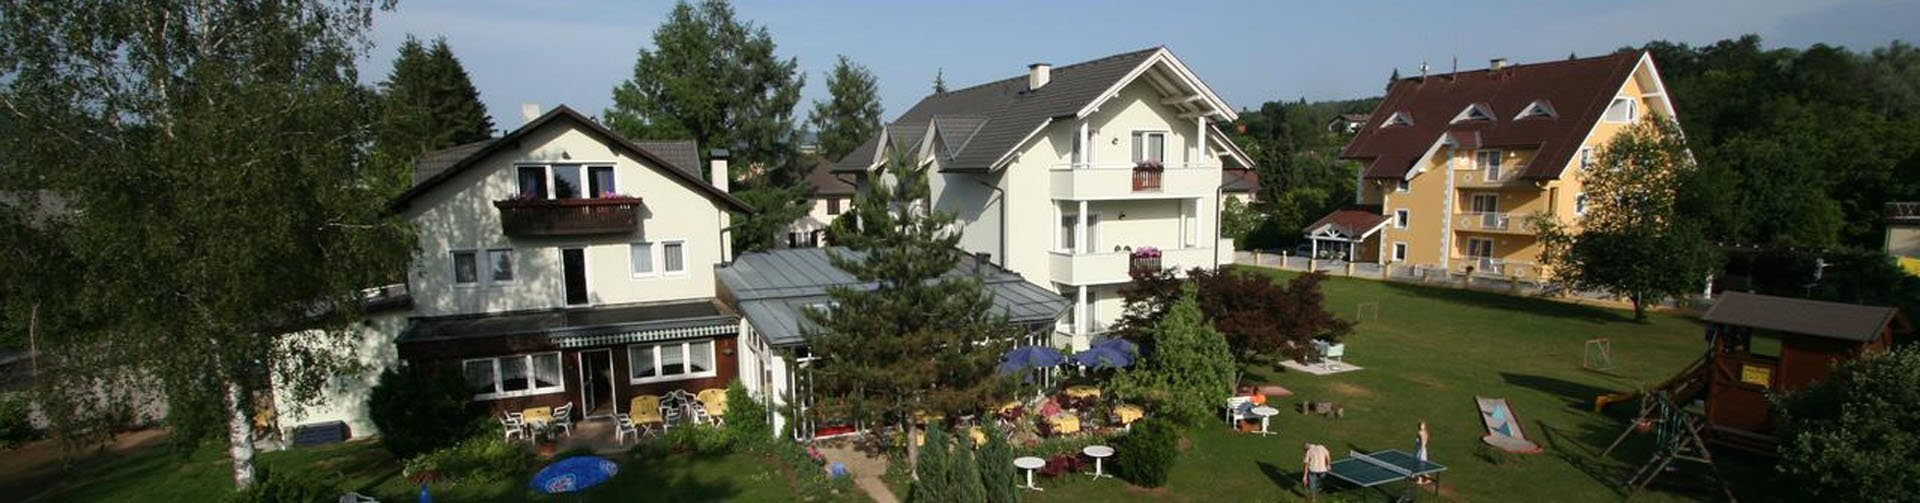 Hotel Villa Flora aan de Oostenrijkse Wörthersee